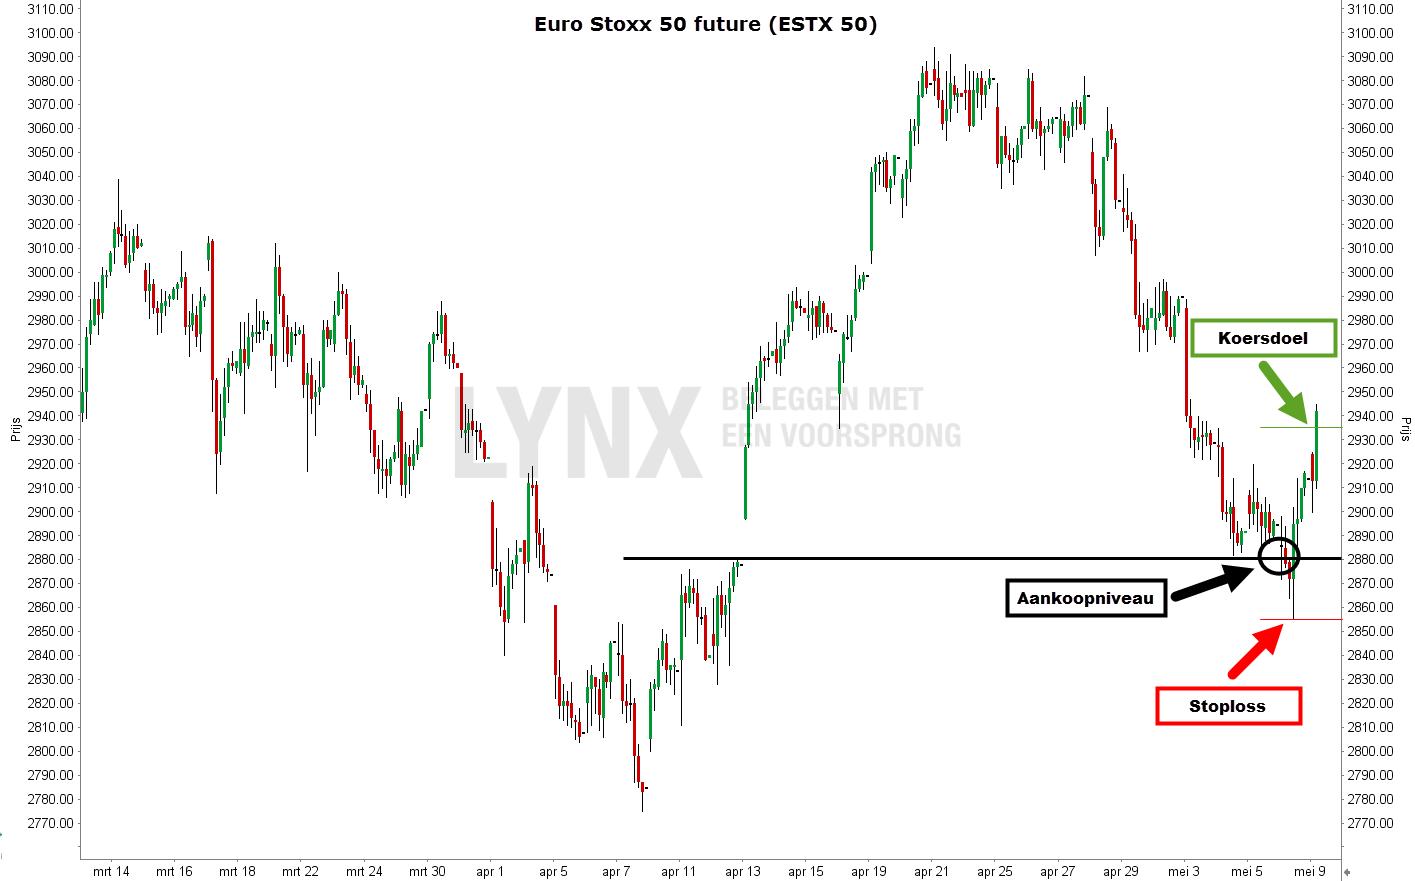 Trading setup in de Euro Stoxx 50 future grafiek met koersdoel en stop loss order